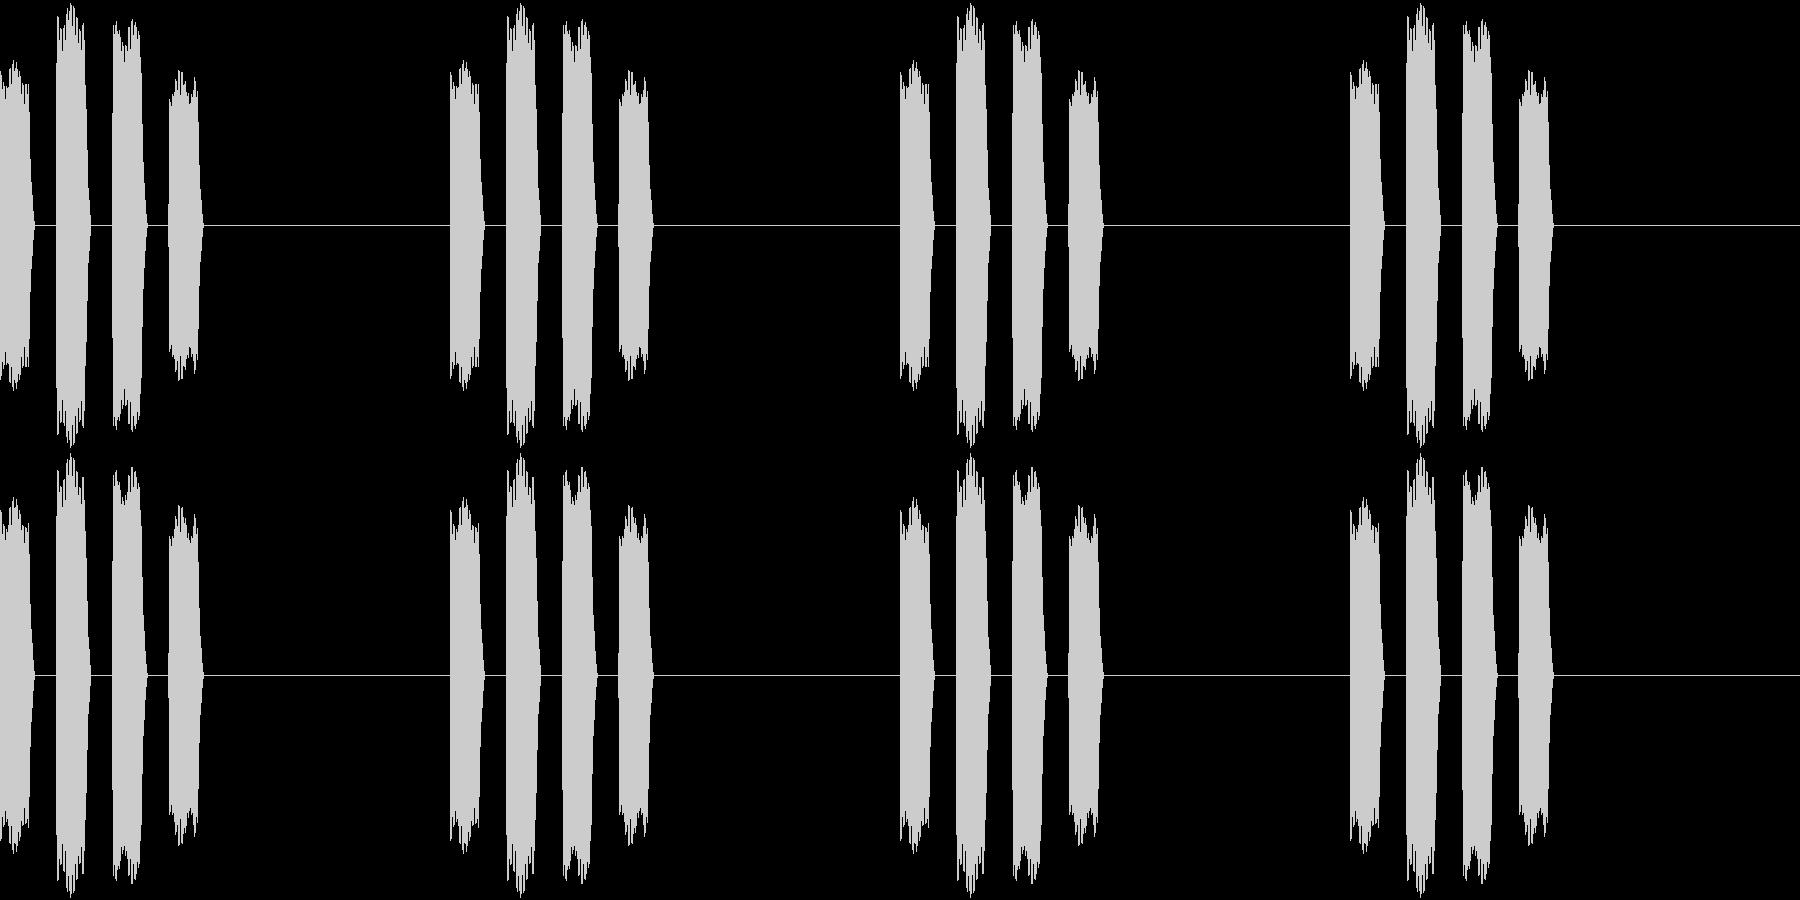 Thermo 体温計の音 ピピピピッ 1の未再生の波形